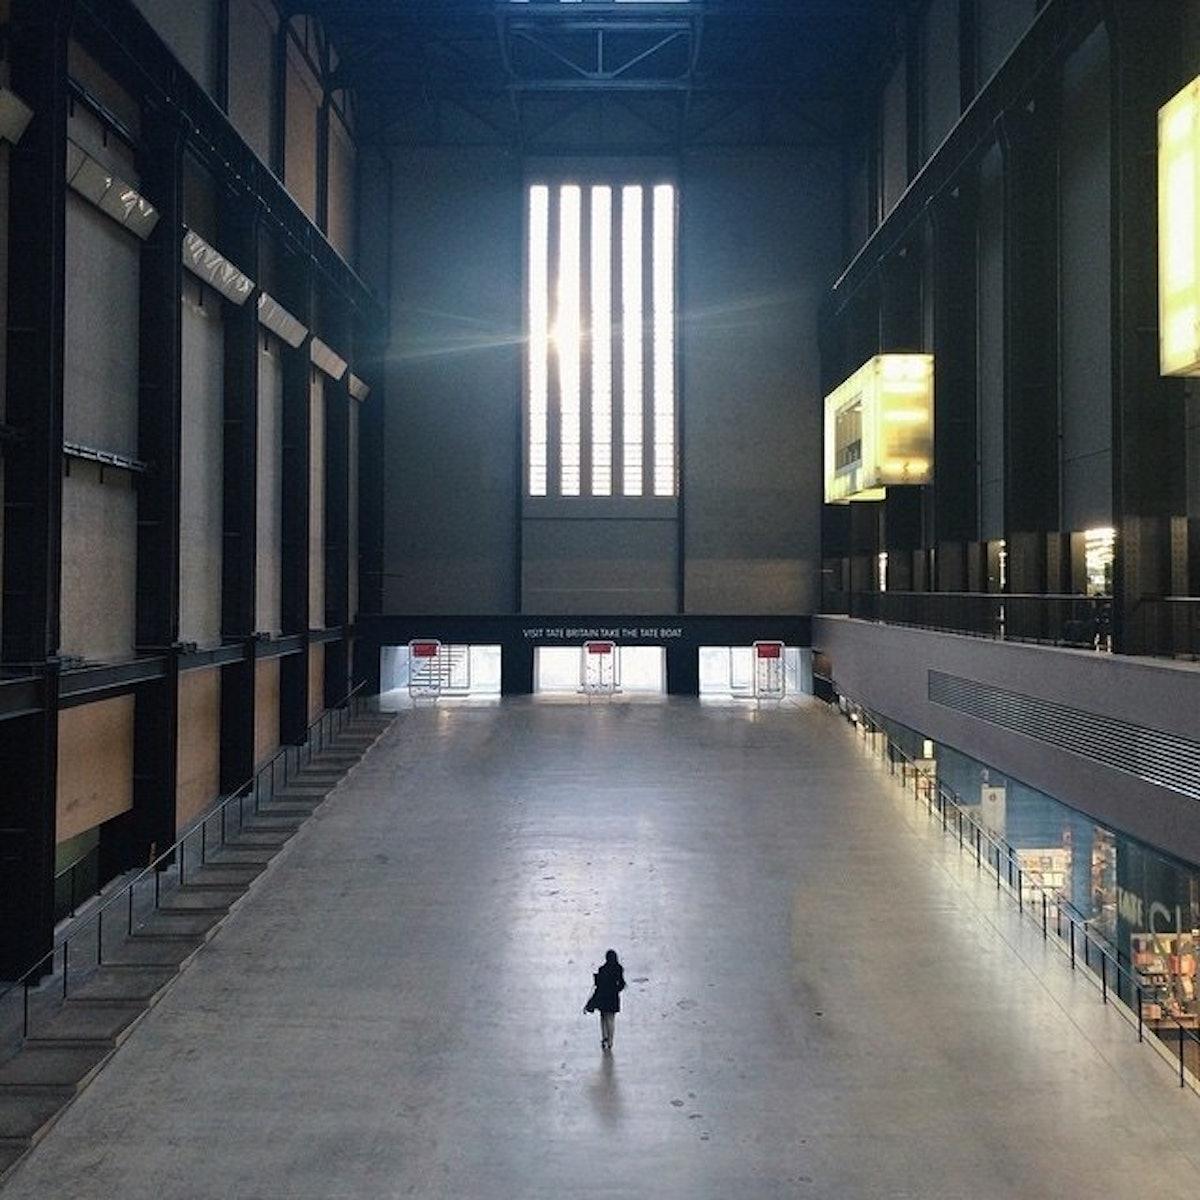 #9. Tate Modern by leegicas